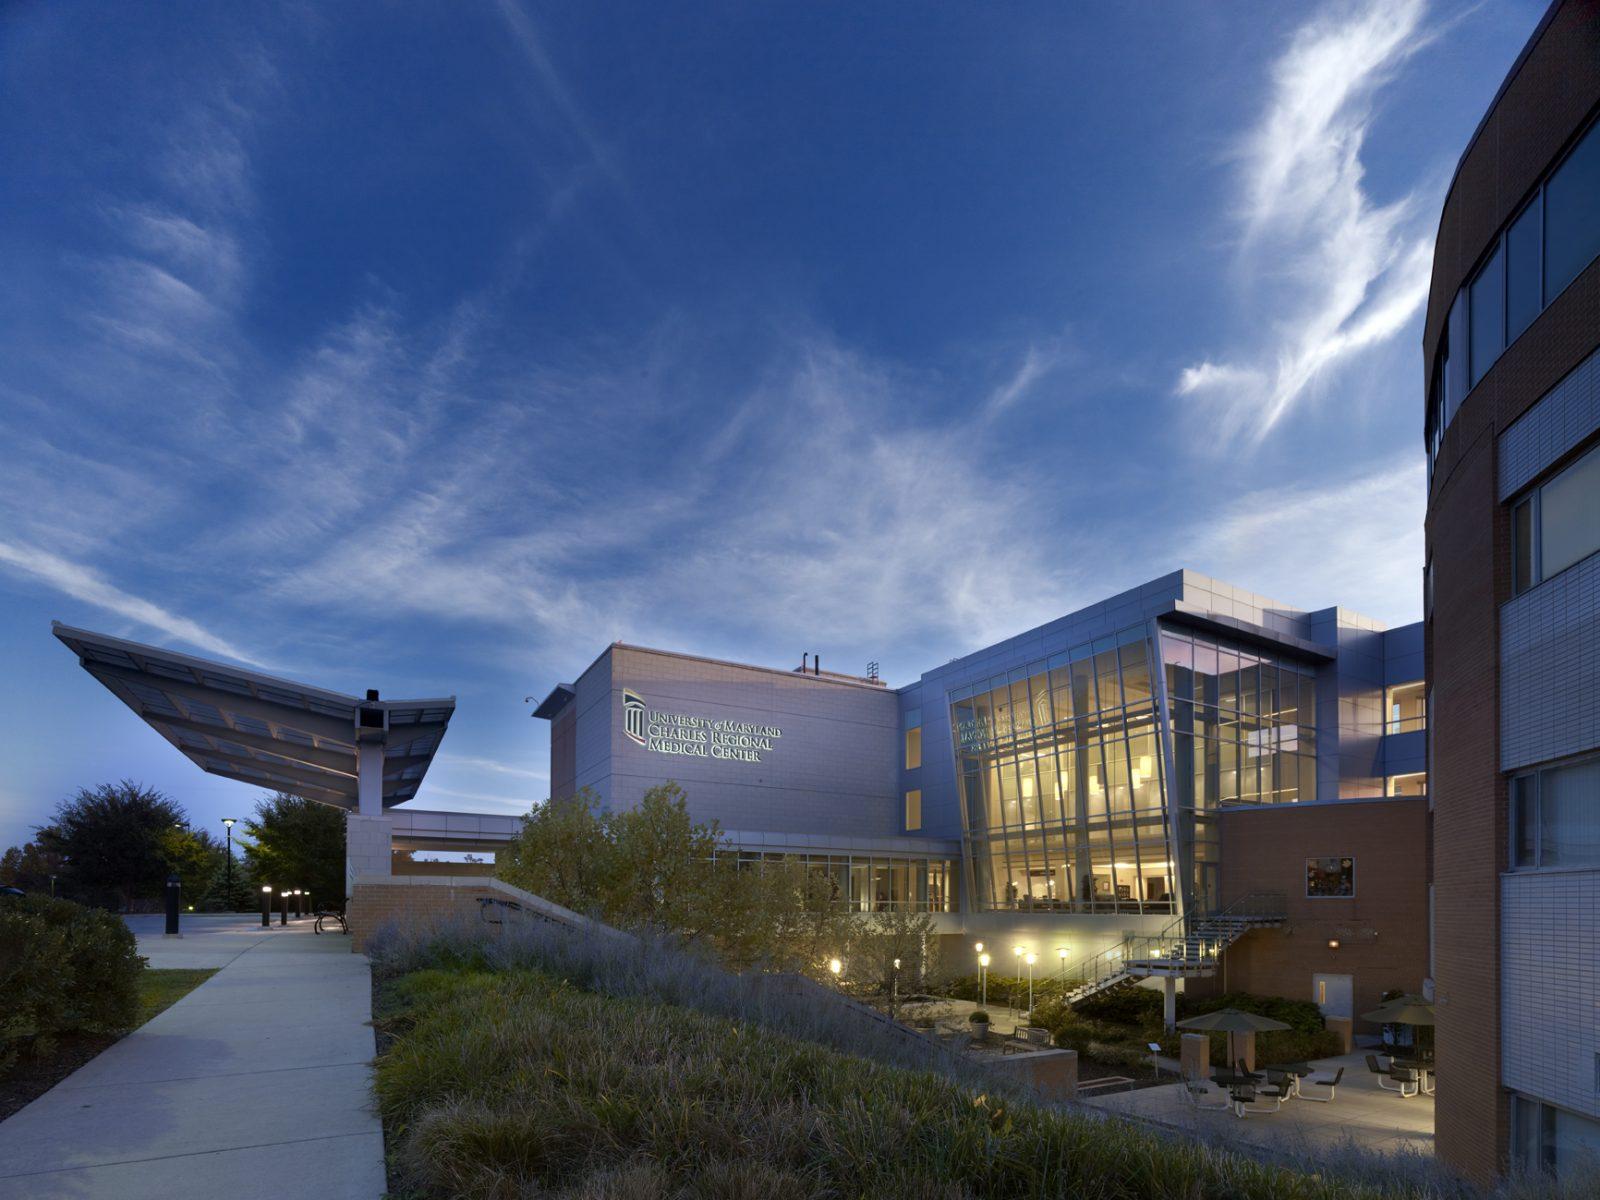 Charles Regional Medical Center